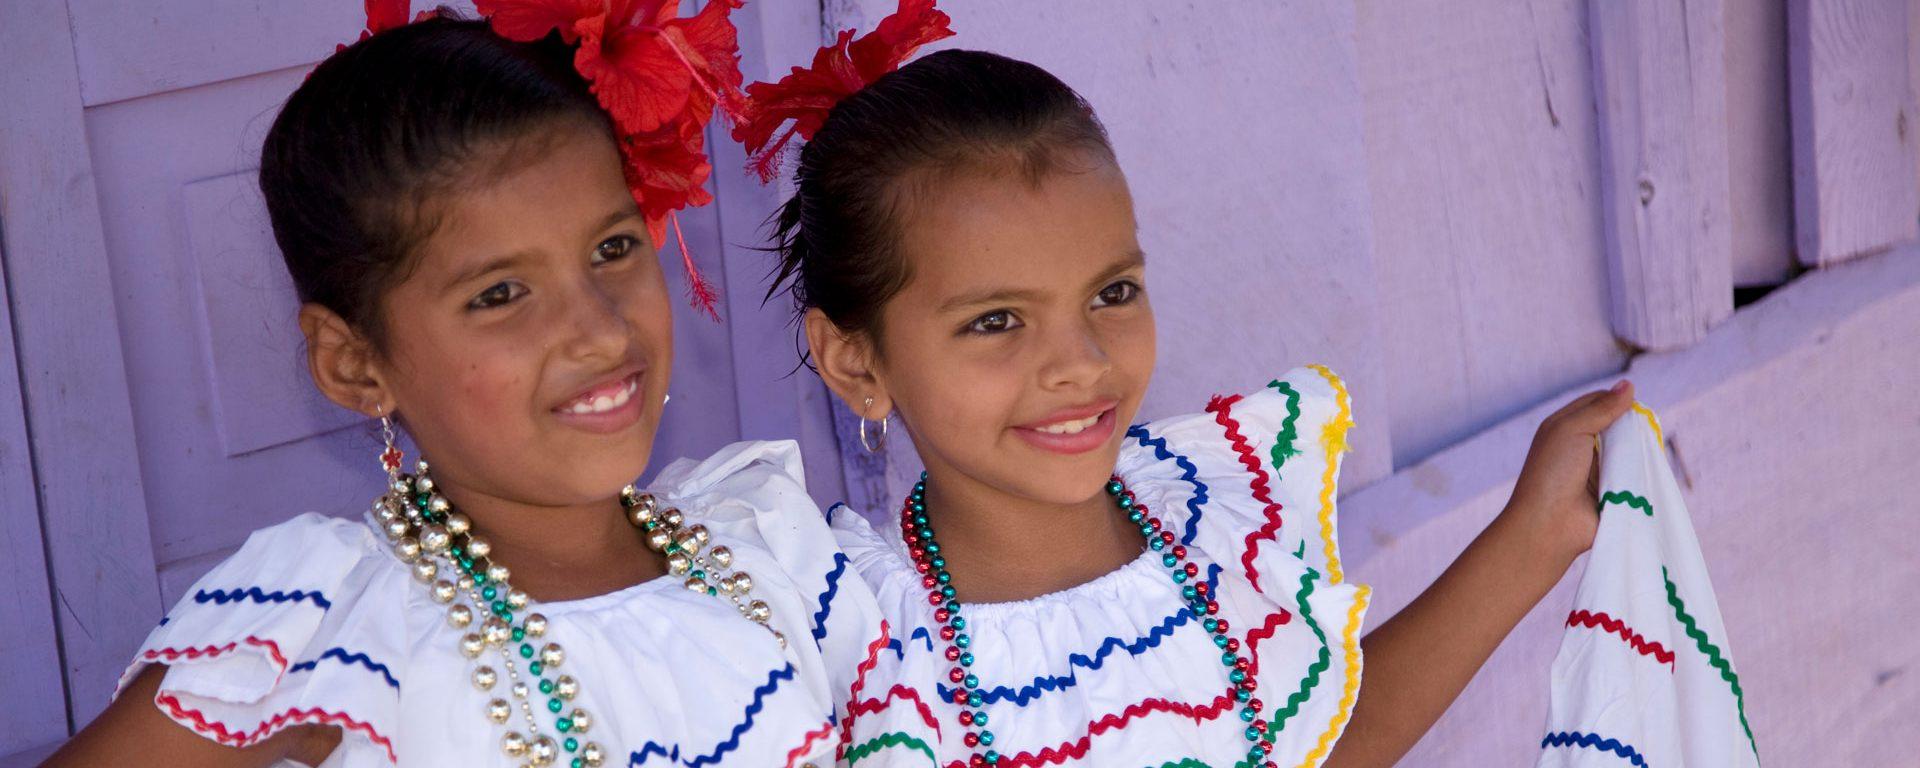 Girls in traditional dress after dance in Villa Esperanza barrio, Granada, Nicaragua